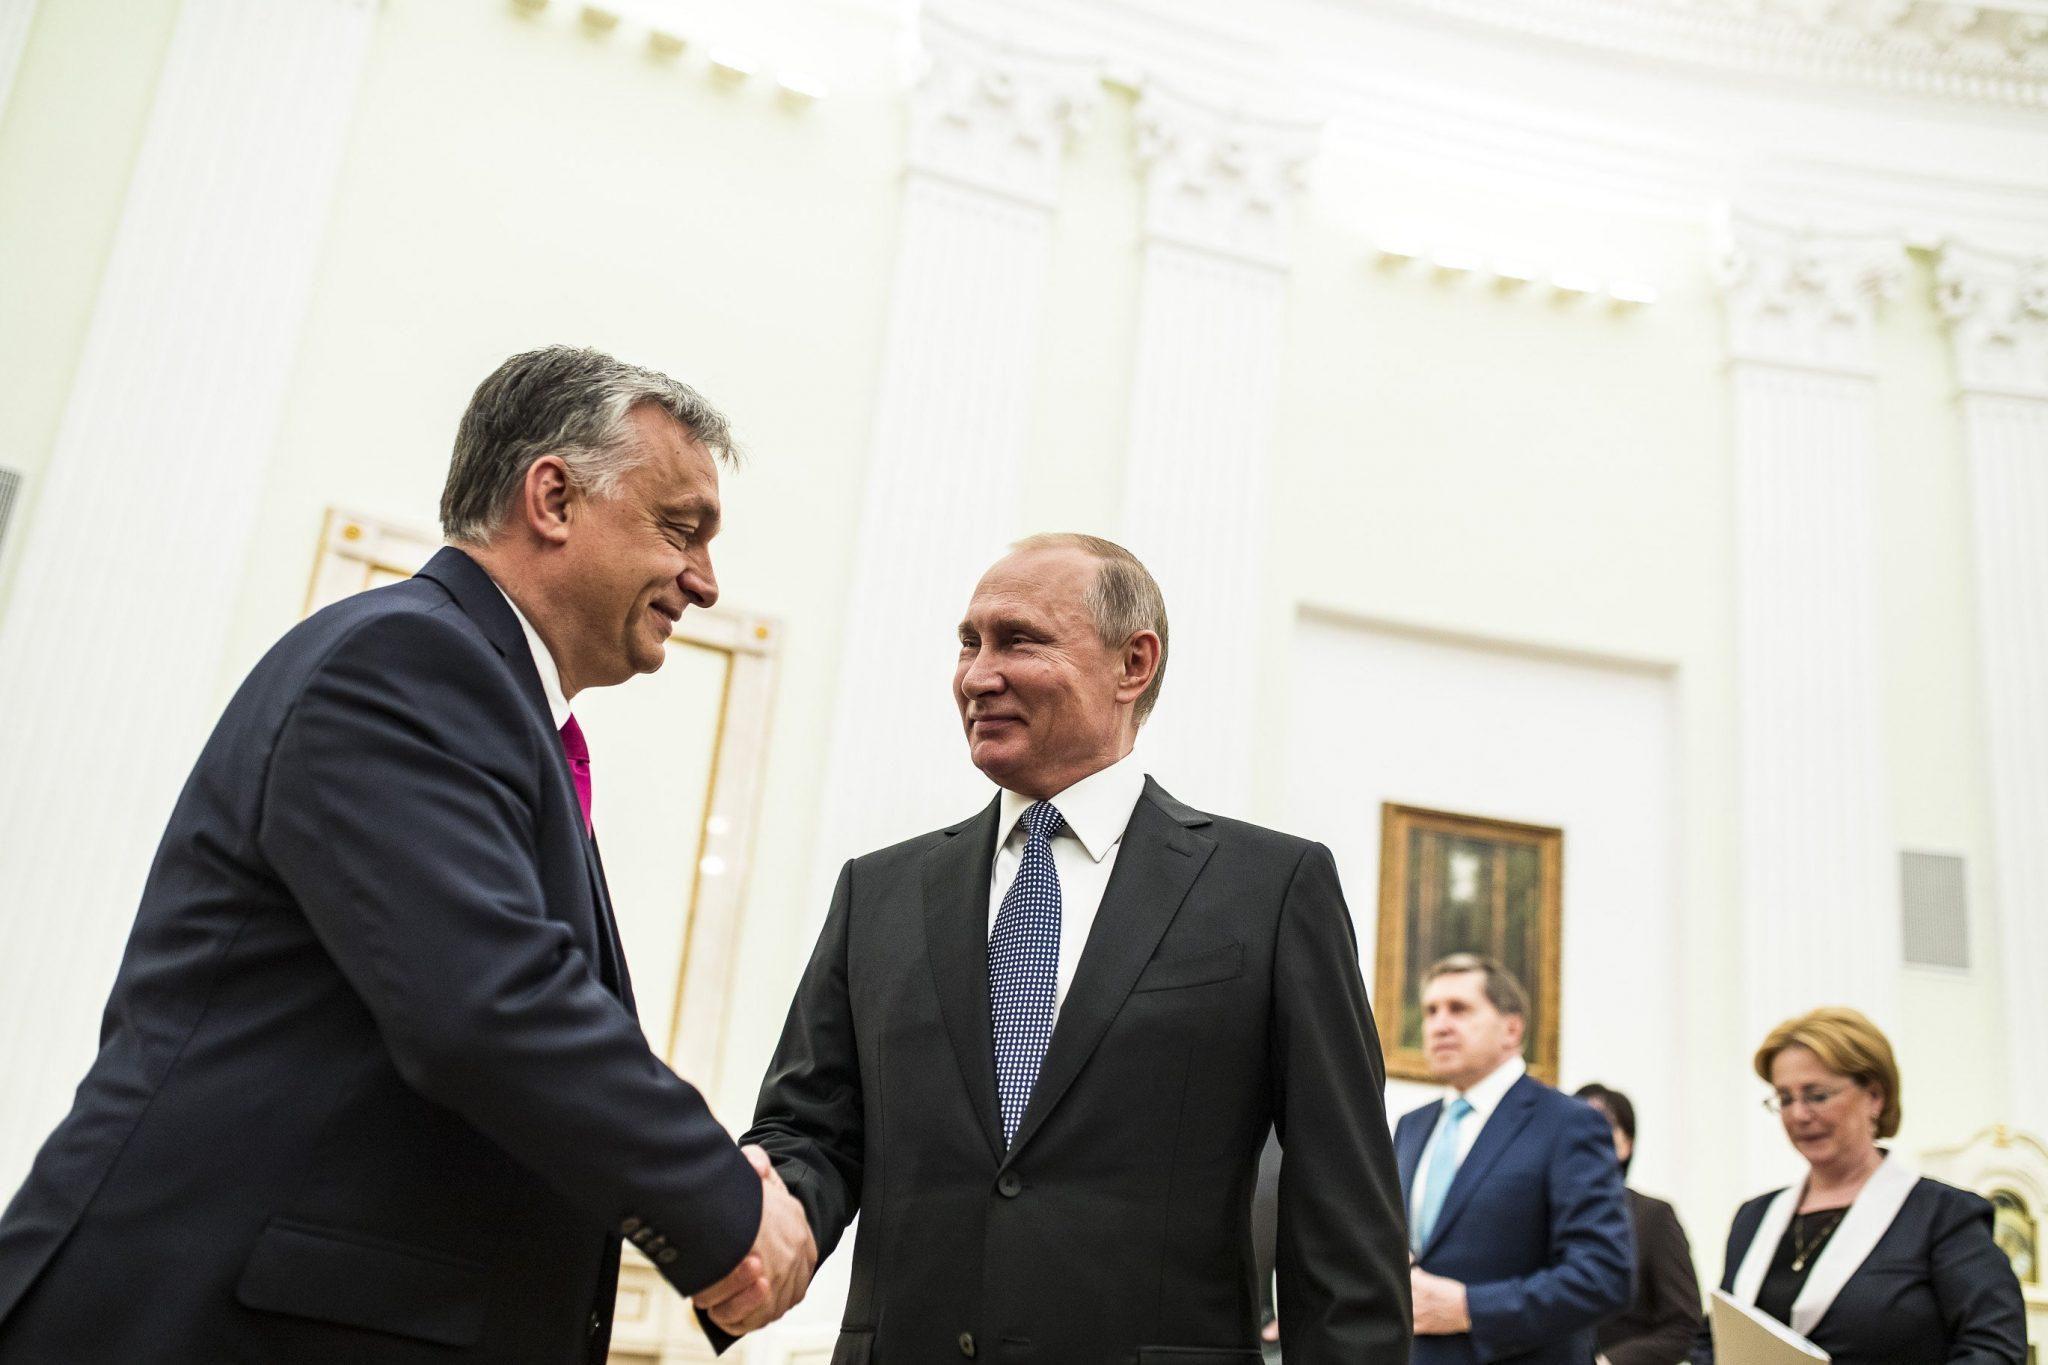 Orbán Putin meeting